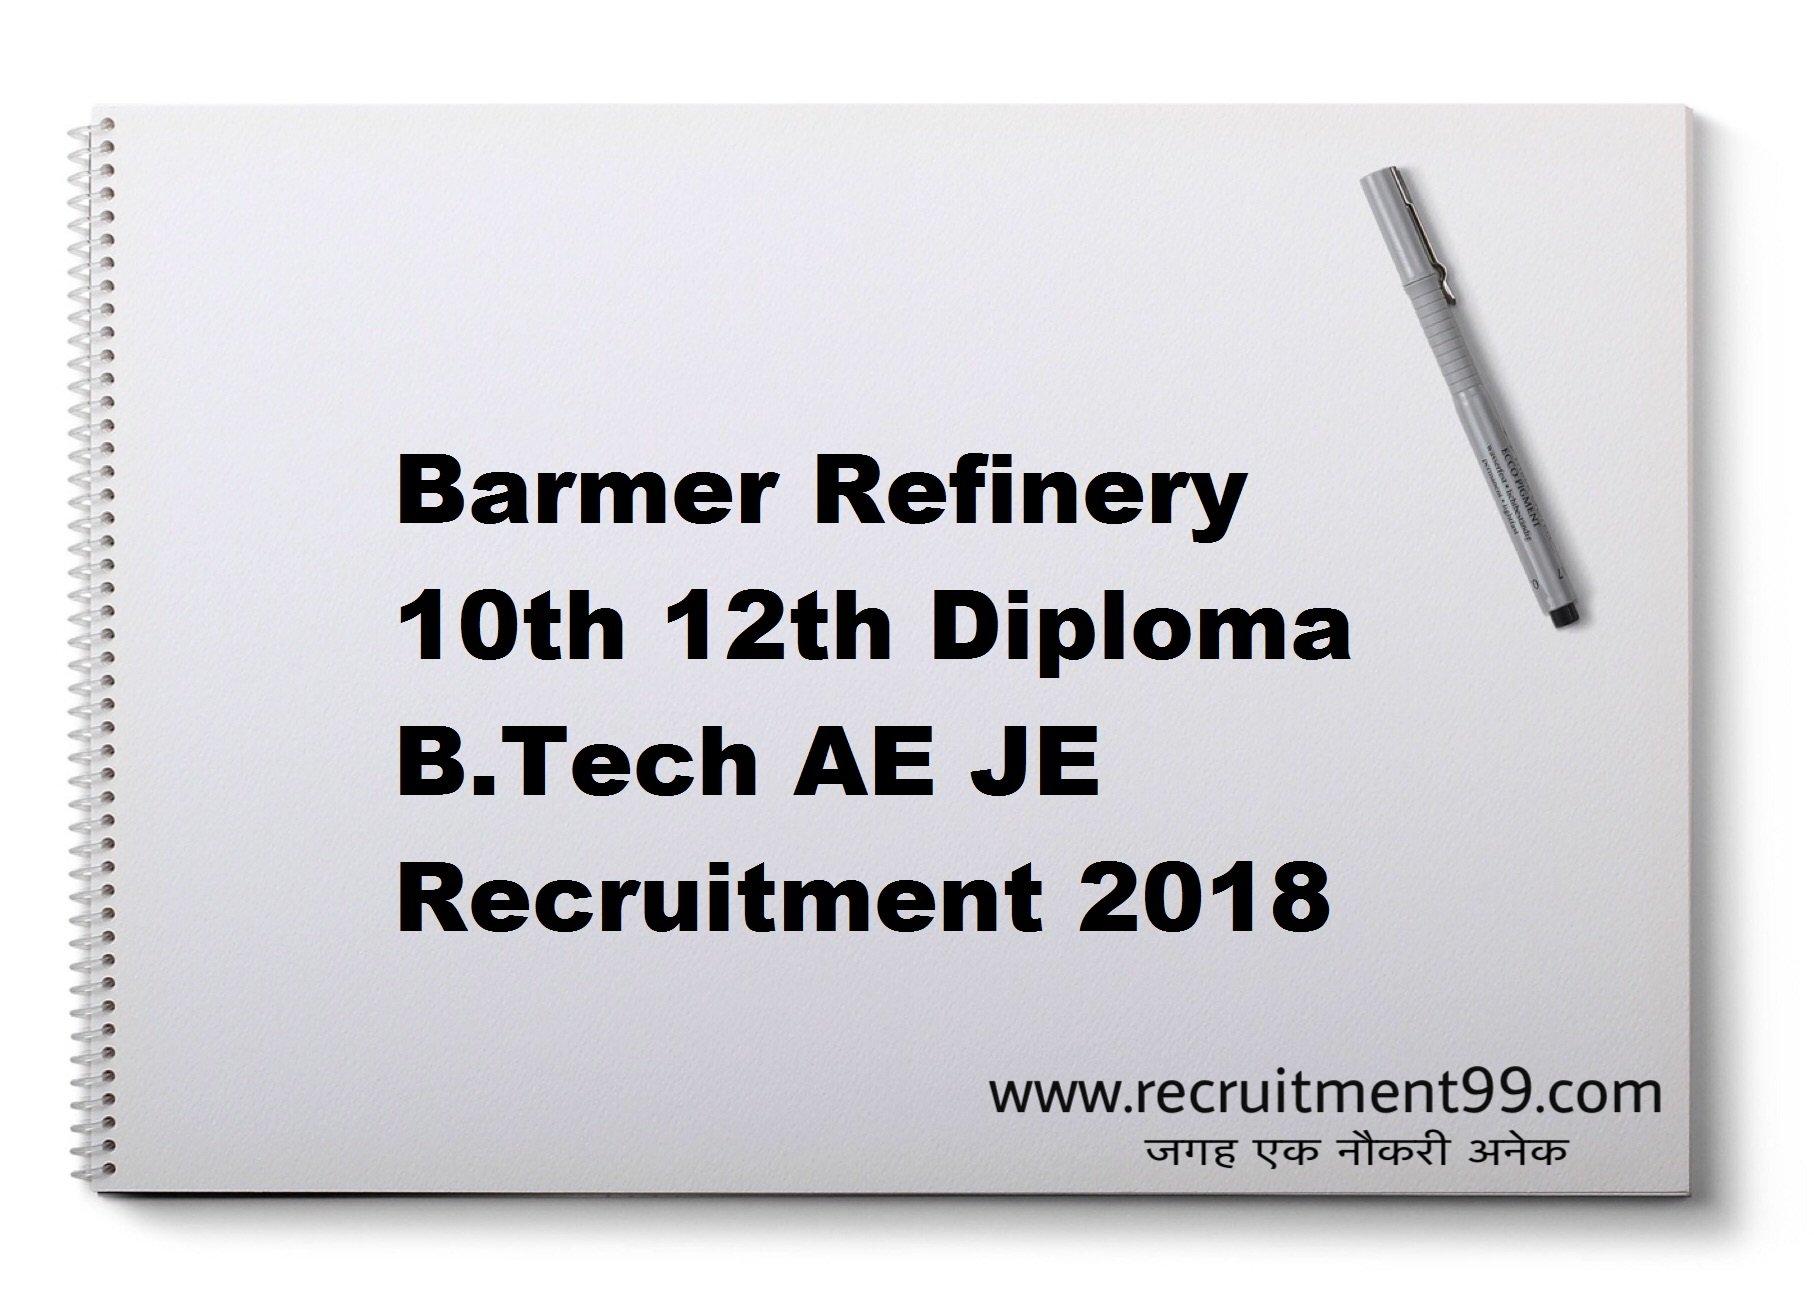 Barmer Refinery 10th 12th Diploma B.Tech AE JE Recruitment 2018